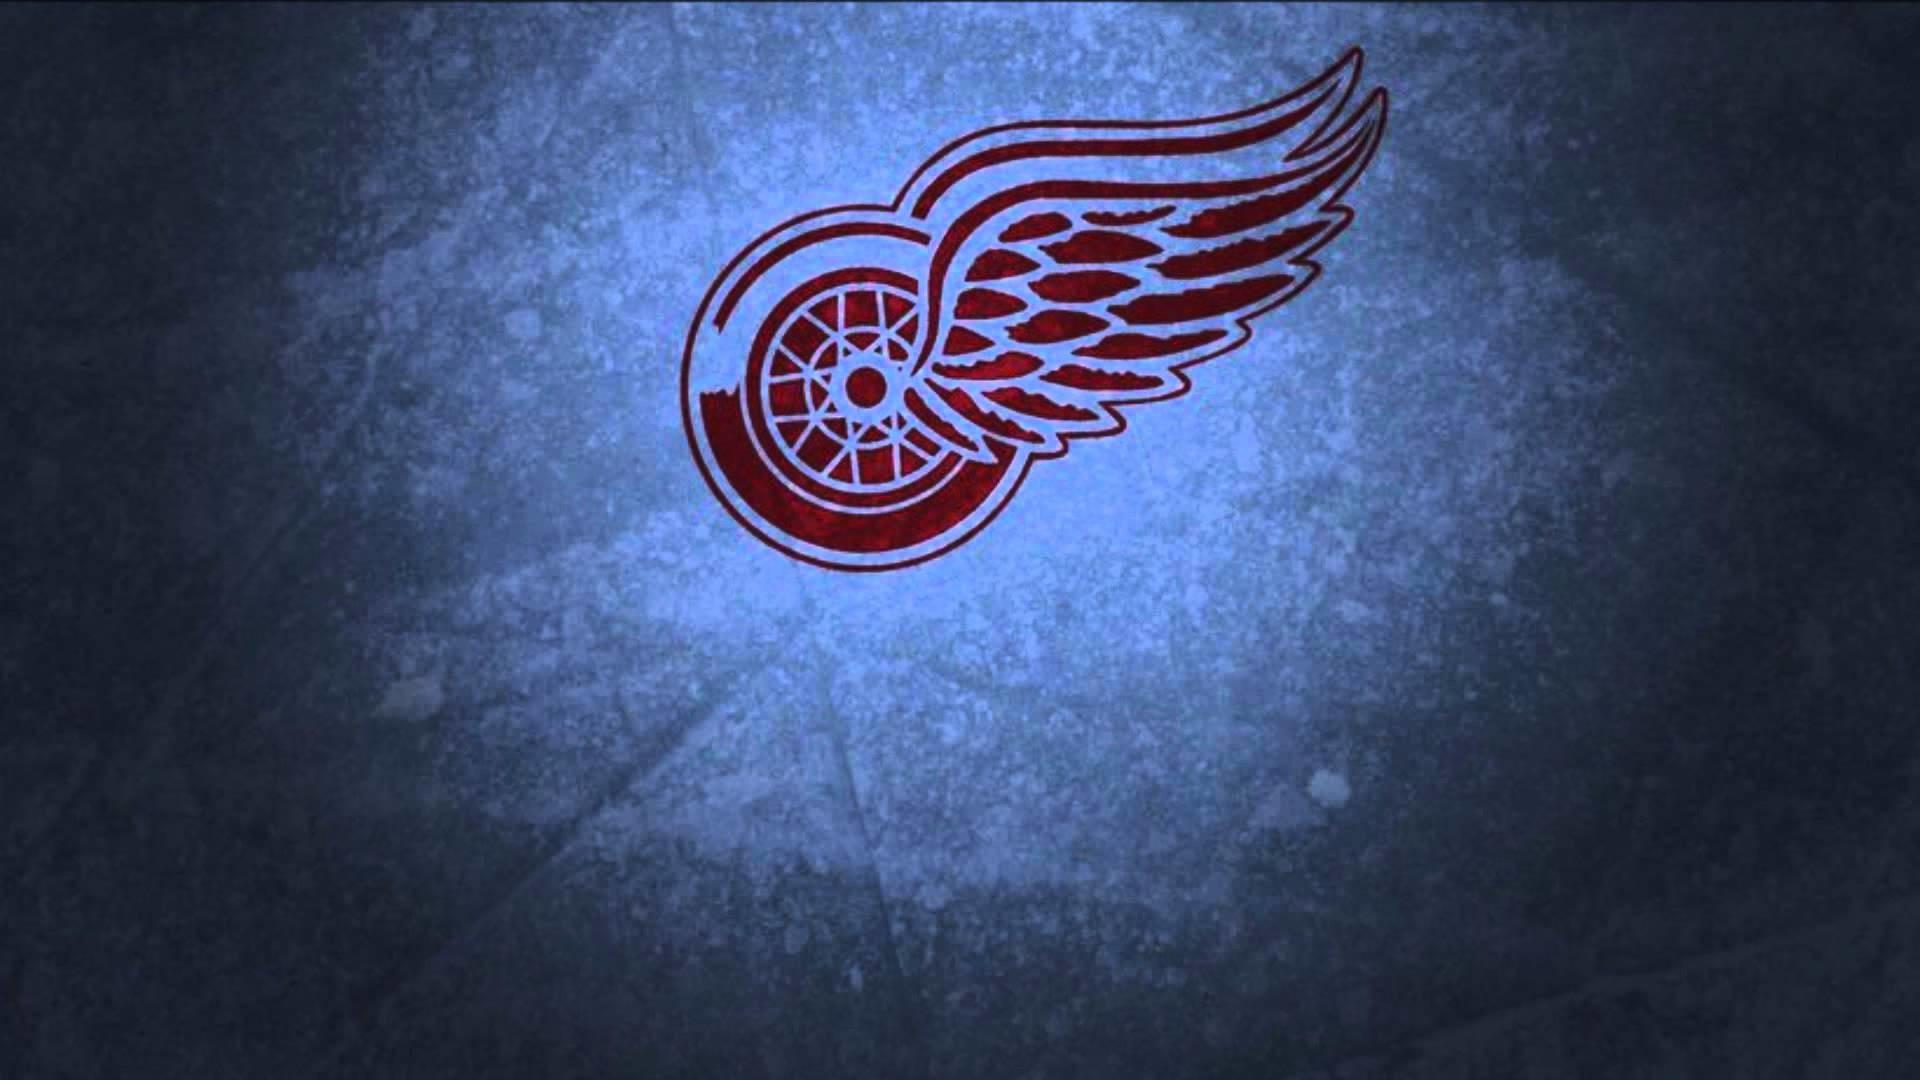 27+ Logo Wallpaper 1920X1080 Detroit Red Wings Pics